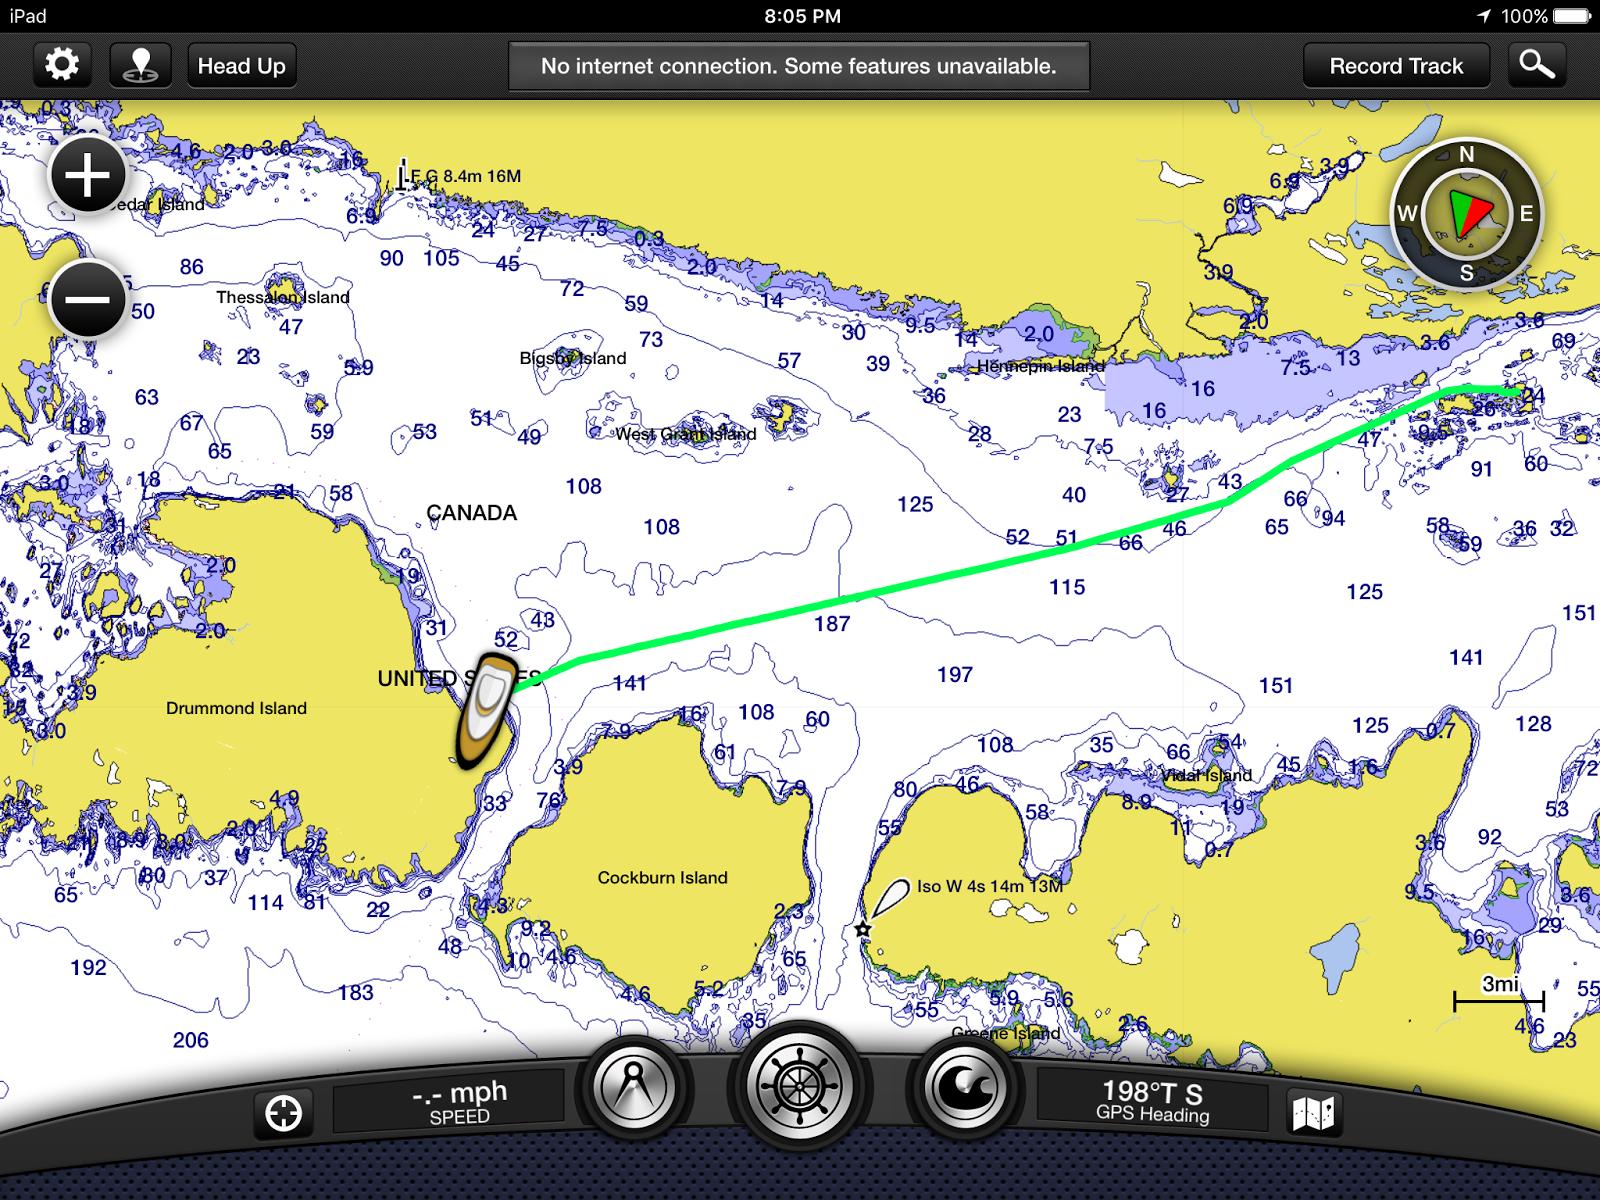 screenshot of turnbull island to pilot cove drummond island track